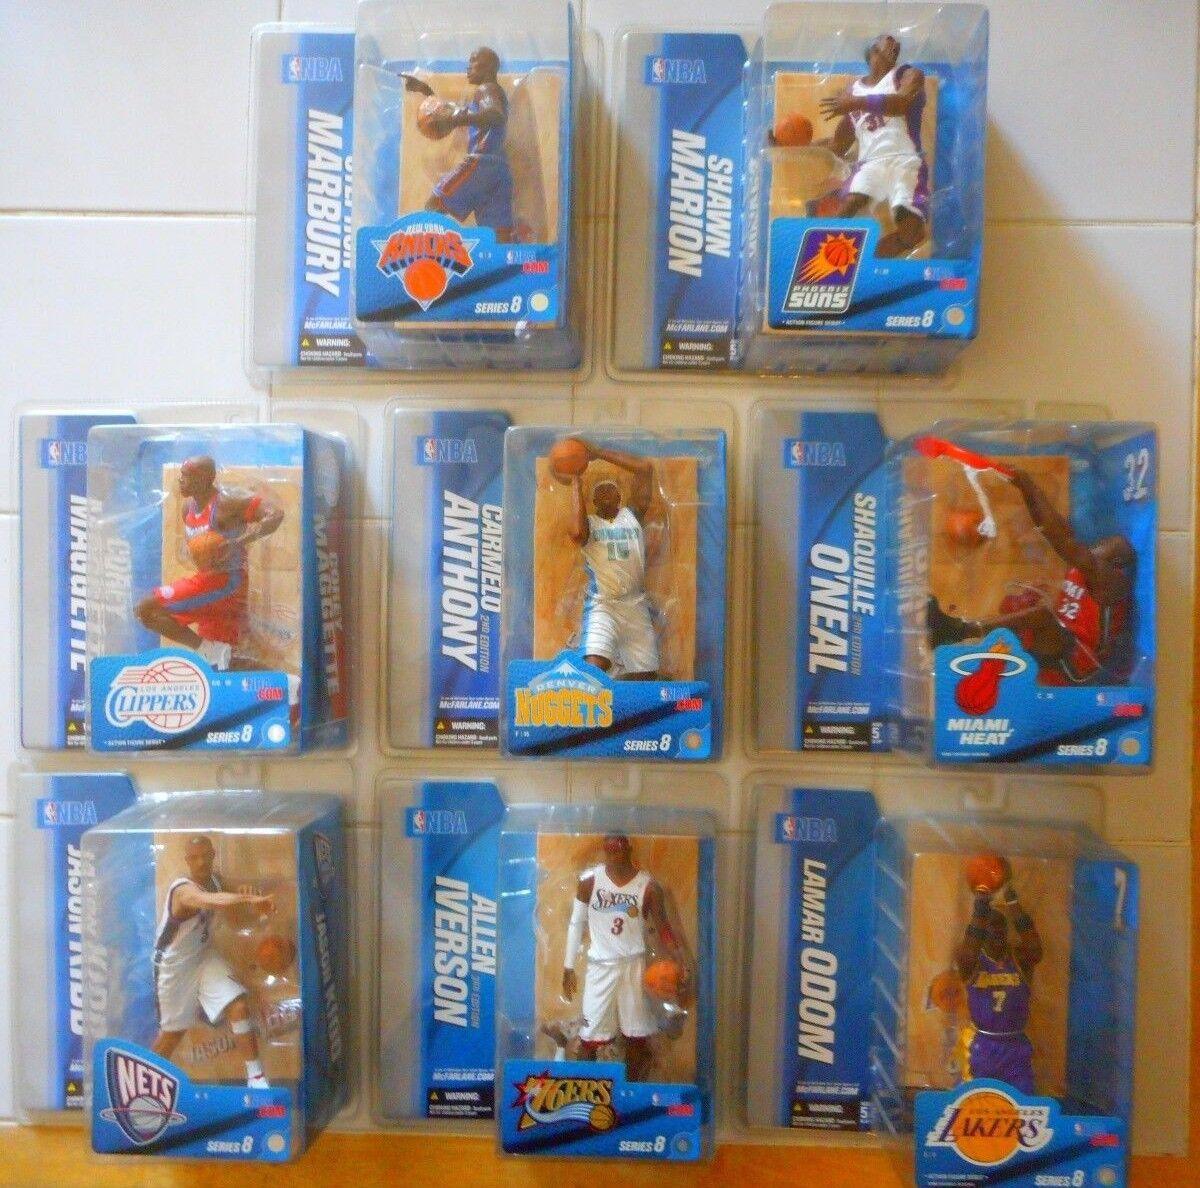 SET MCFARLANE S8 NBA/ALLEN IVERSON/SHAQUILLE O'NEIL/CARMELO ANTHONY/MARBURY